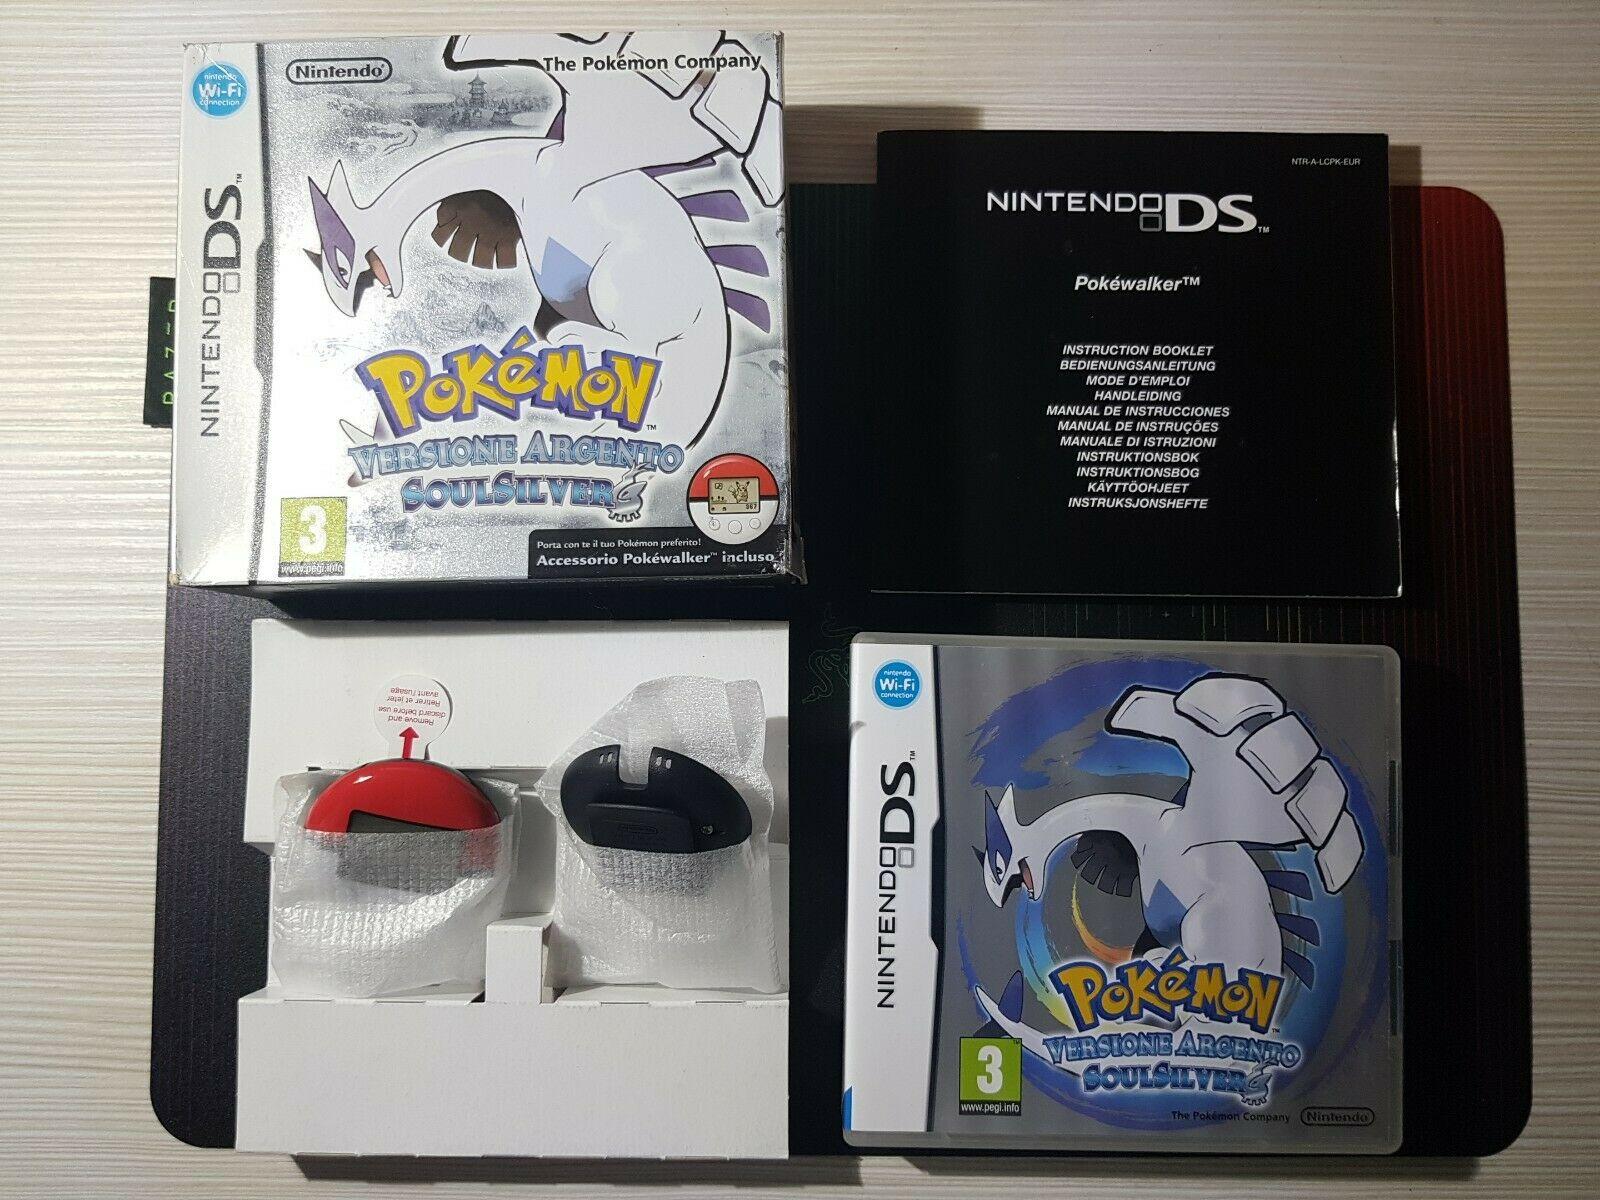 Panoramica Pokémon Versione Argento SoulSilver con Pokewalker